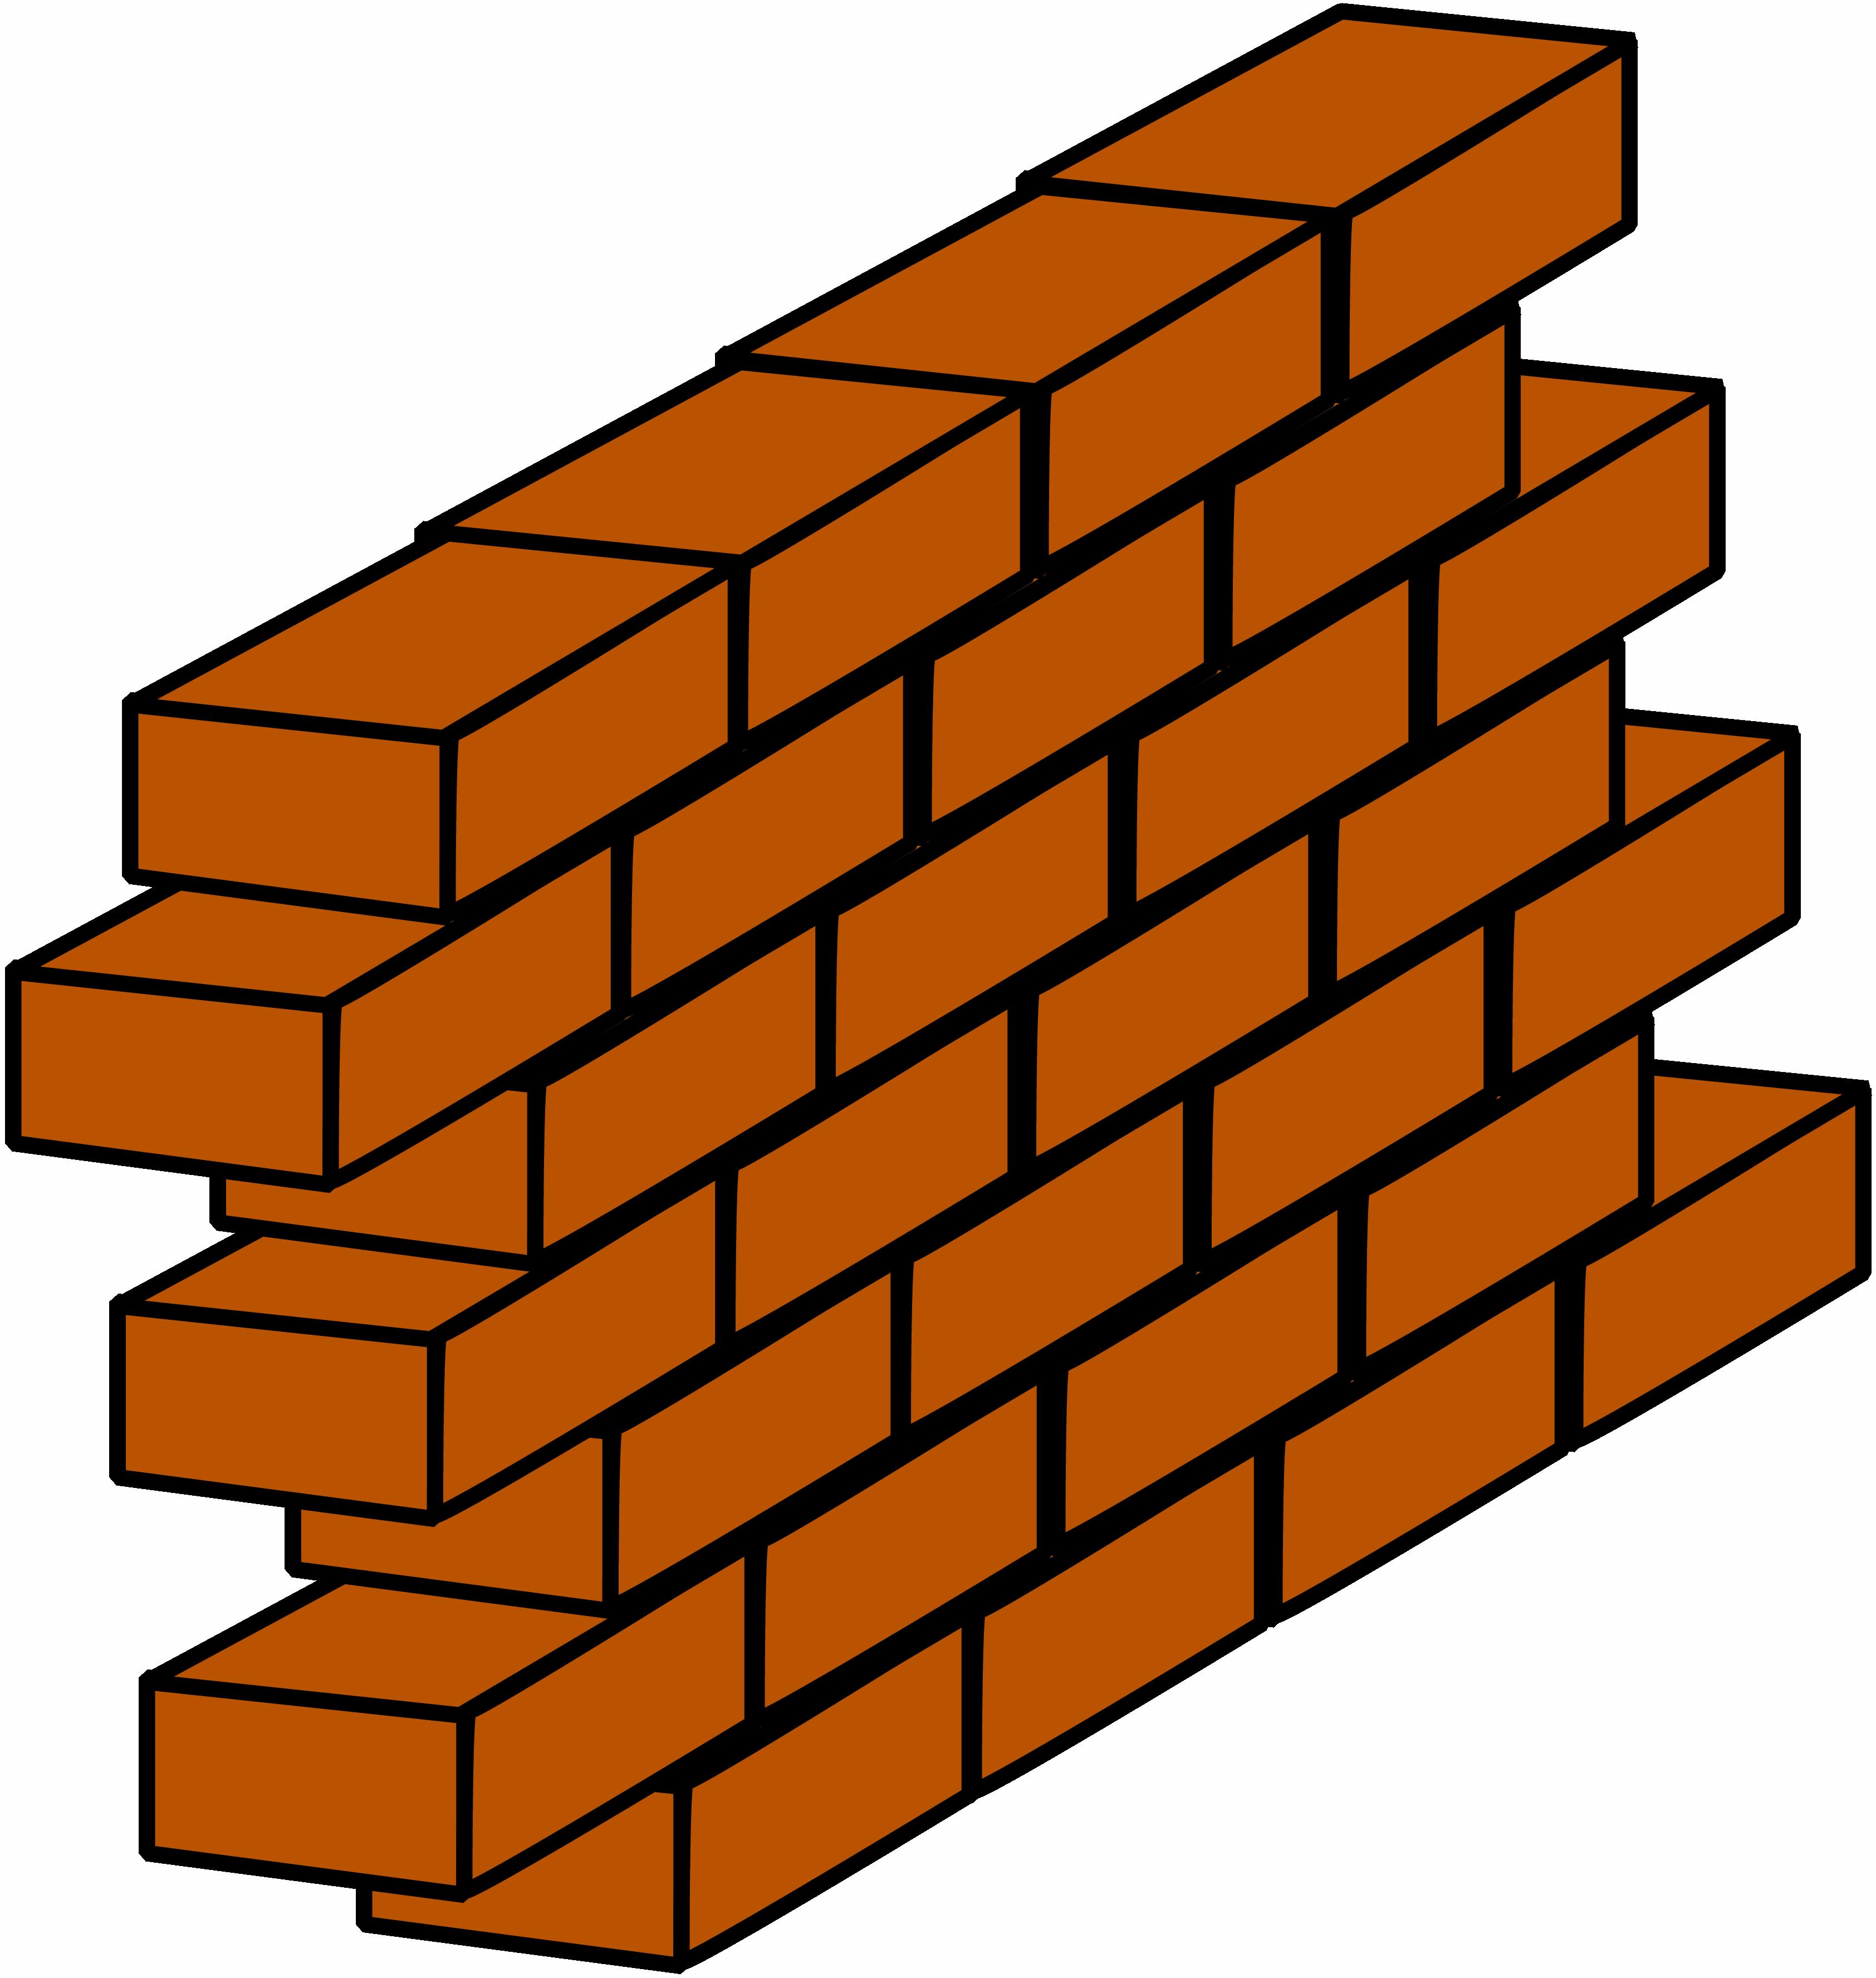 Building blocks clip art clipart graphic freeuse library Brick Clip Art Pattern | Clipart Panda - Free Clipart Images graphic freeuse library